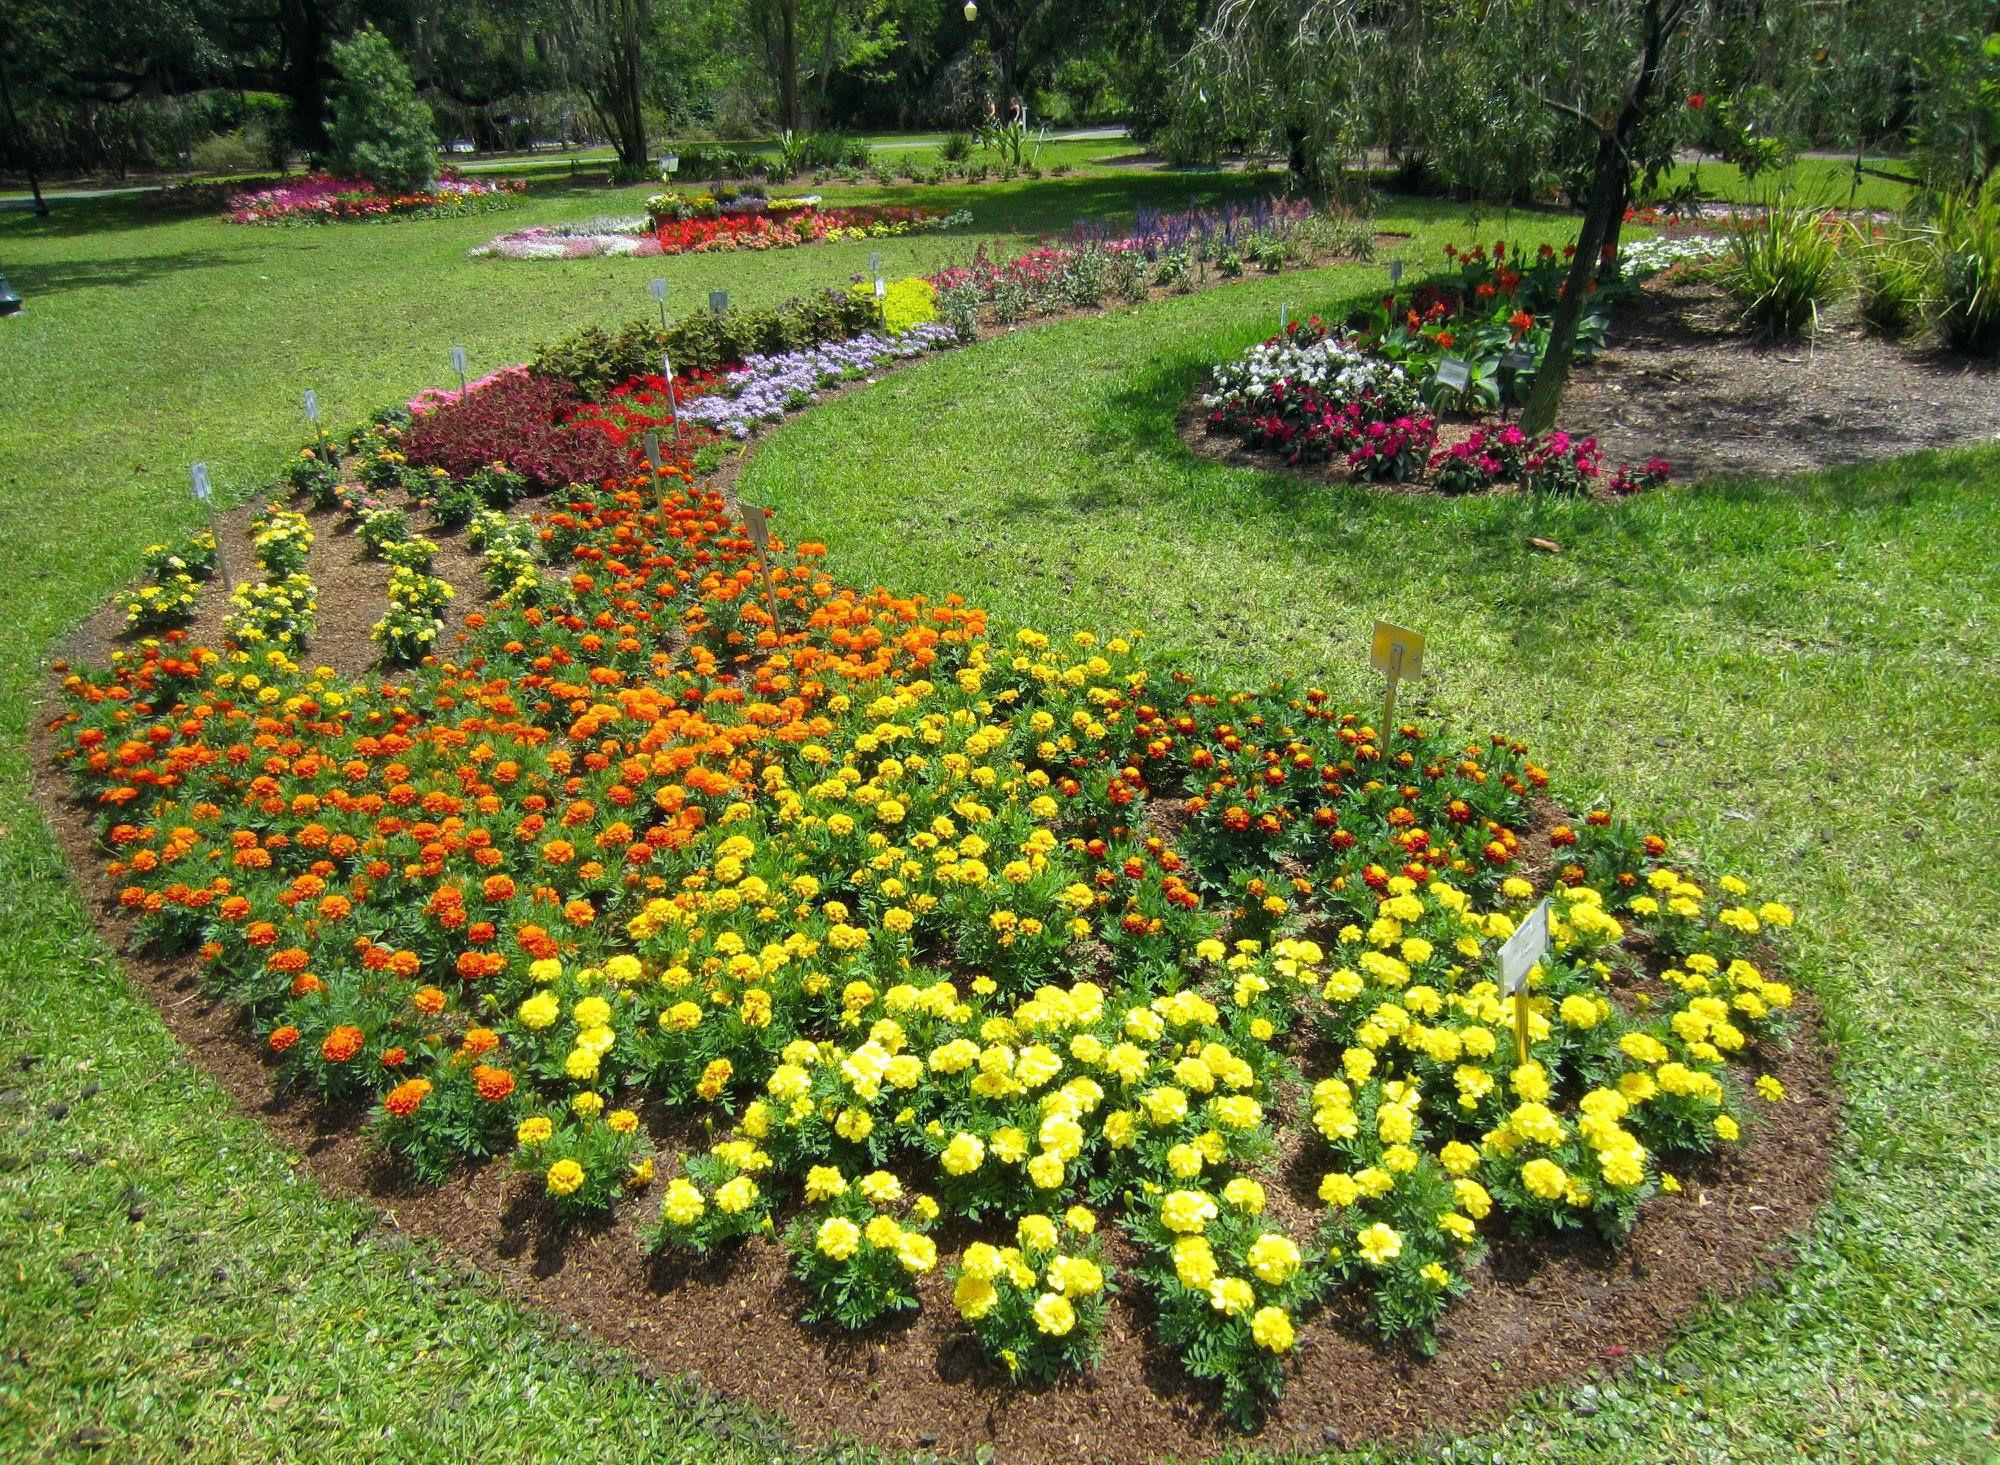 flowers at Harry P. Leu Gardens